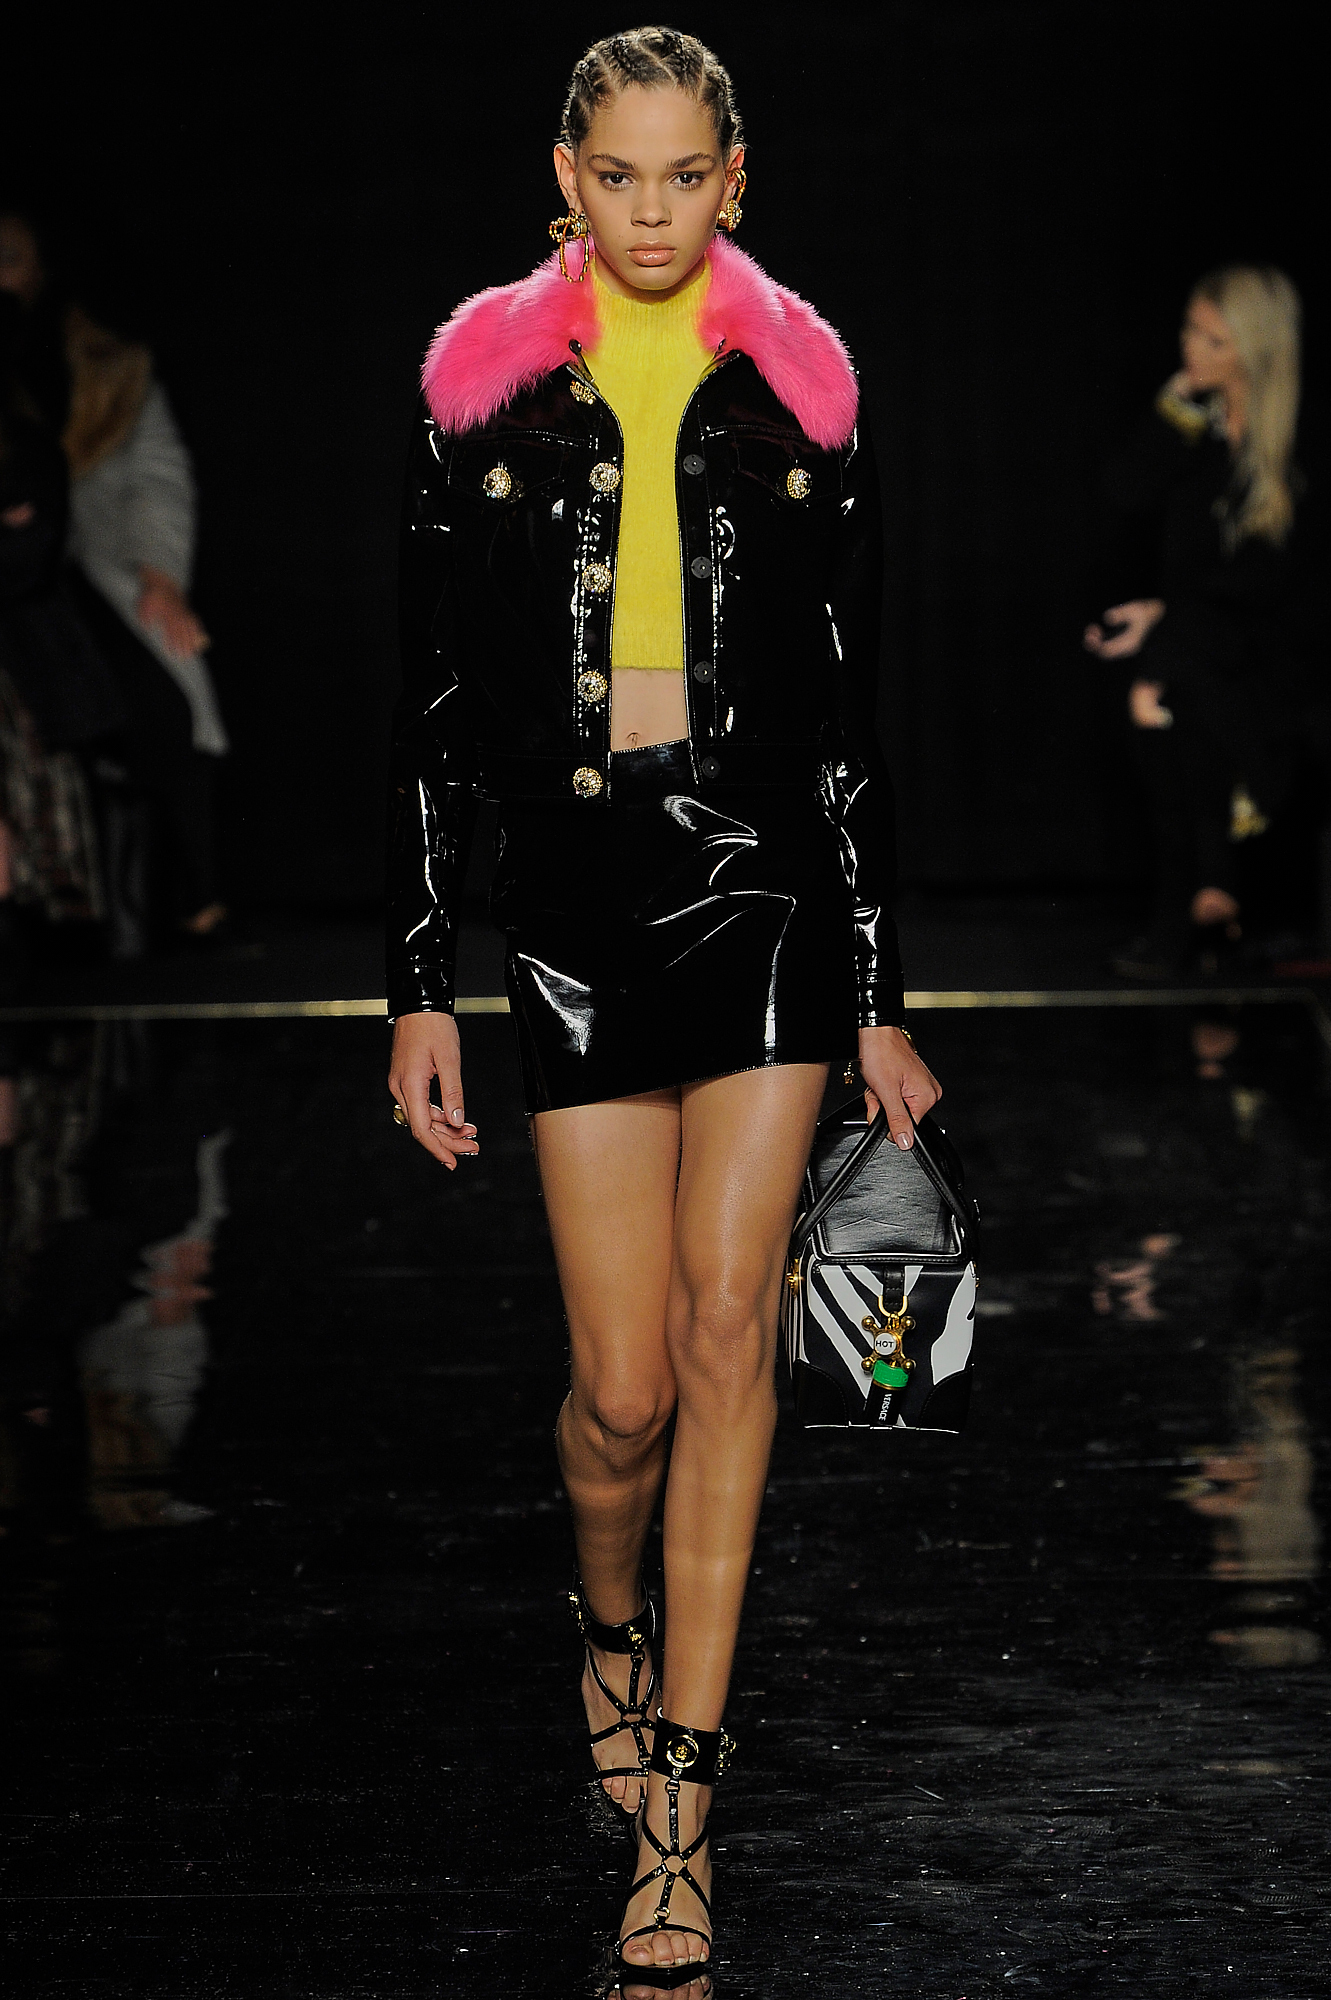 Versace_35_7d_versace_runway_runway_00035.jpg